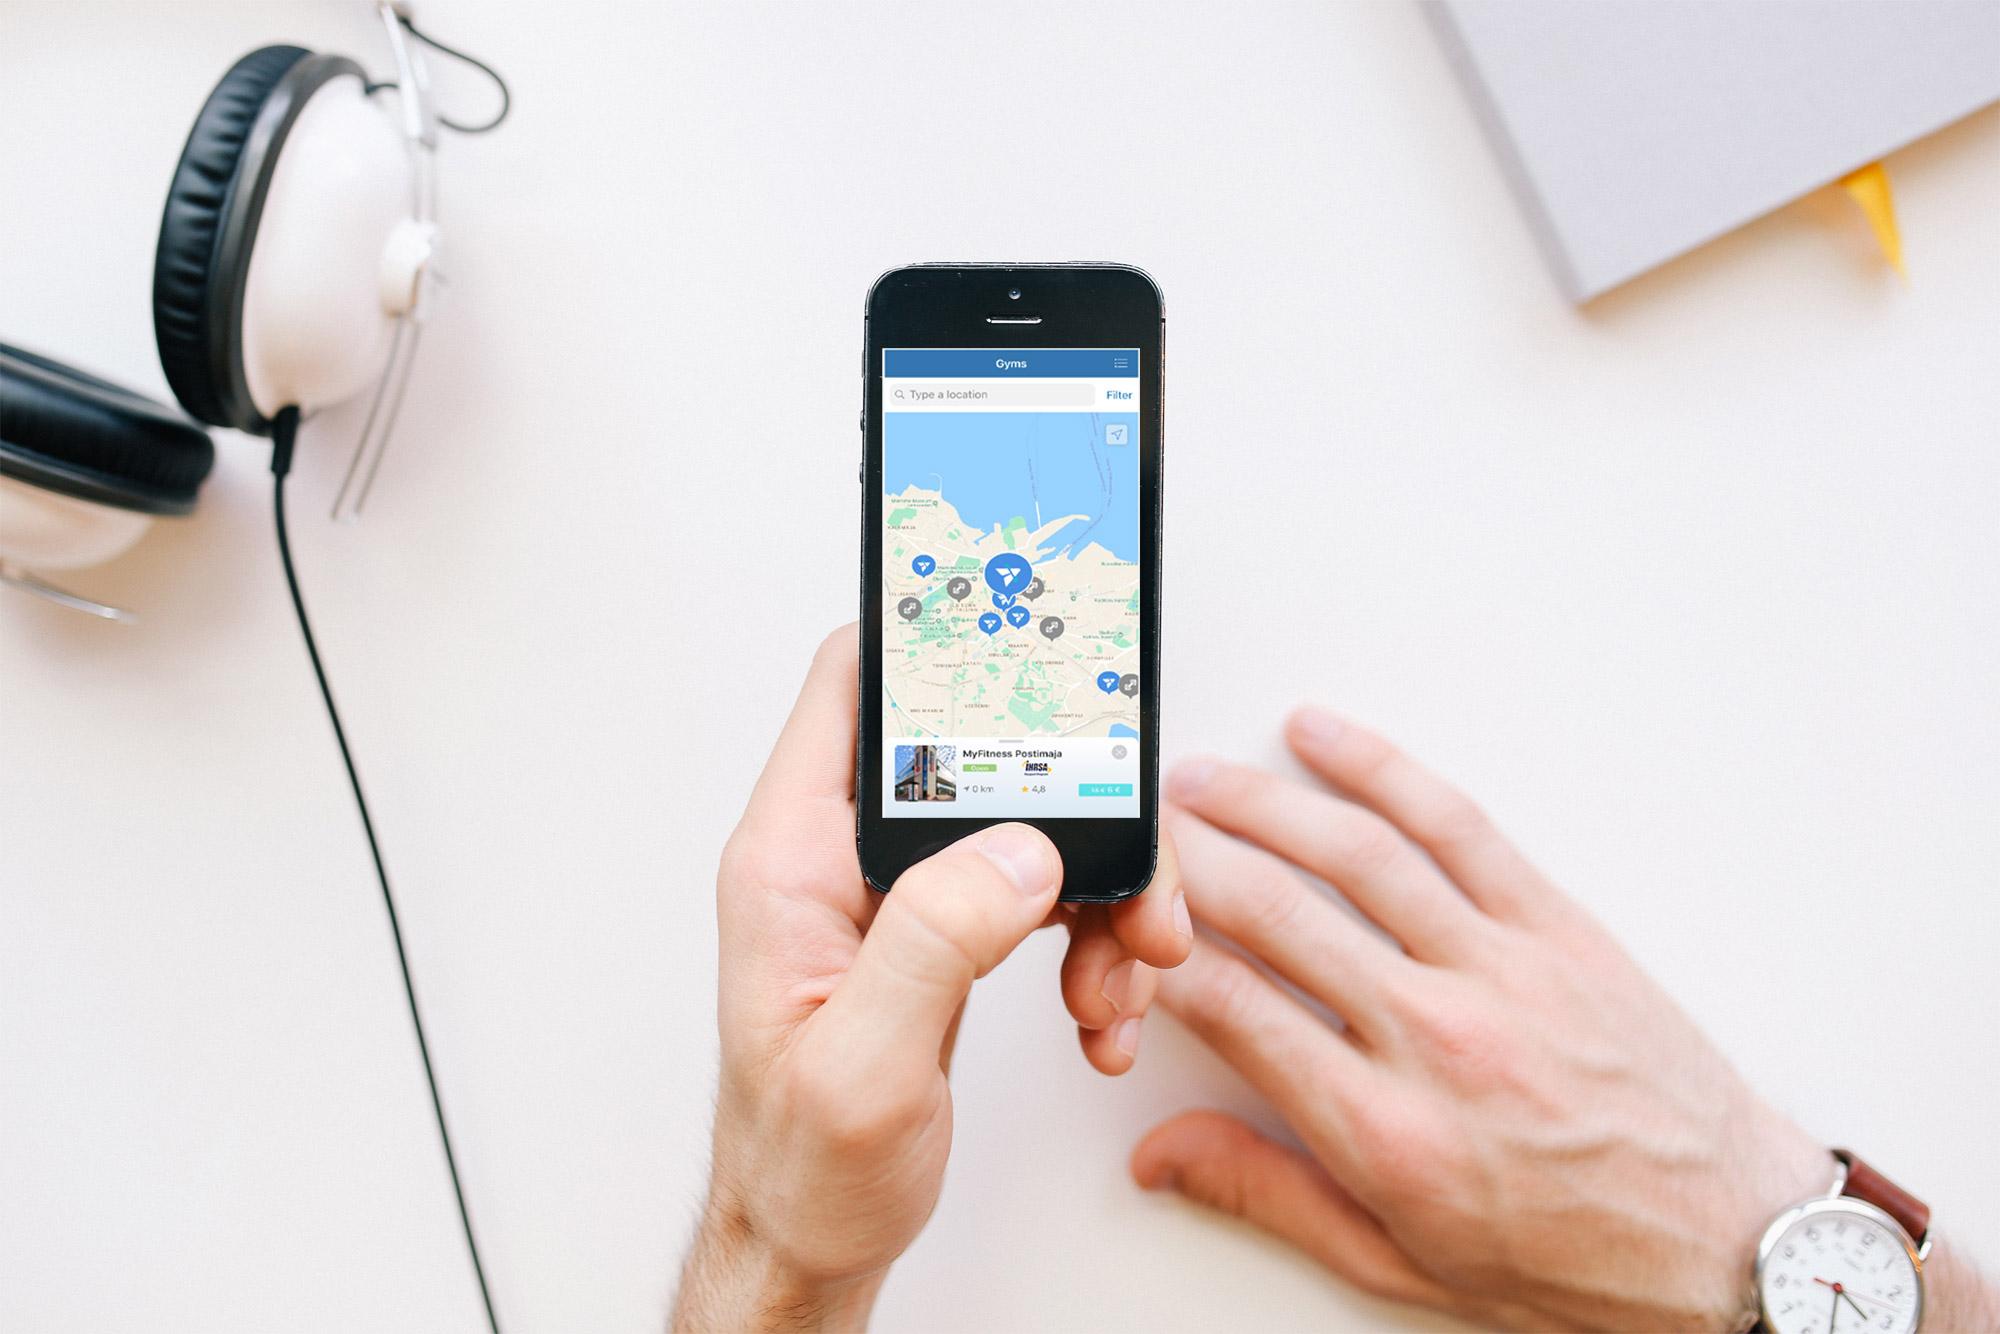 app-image.jpg